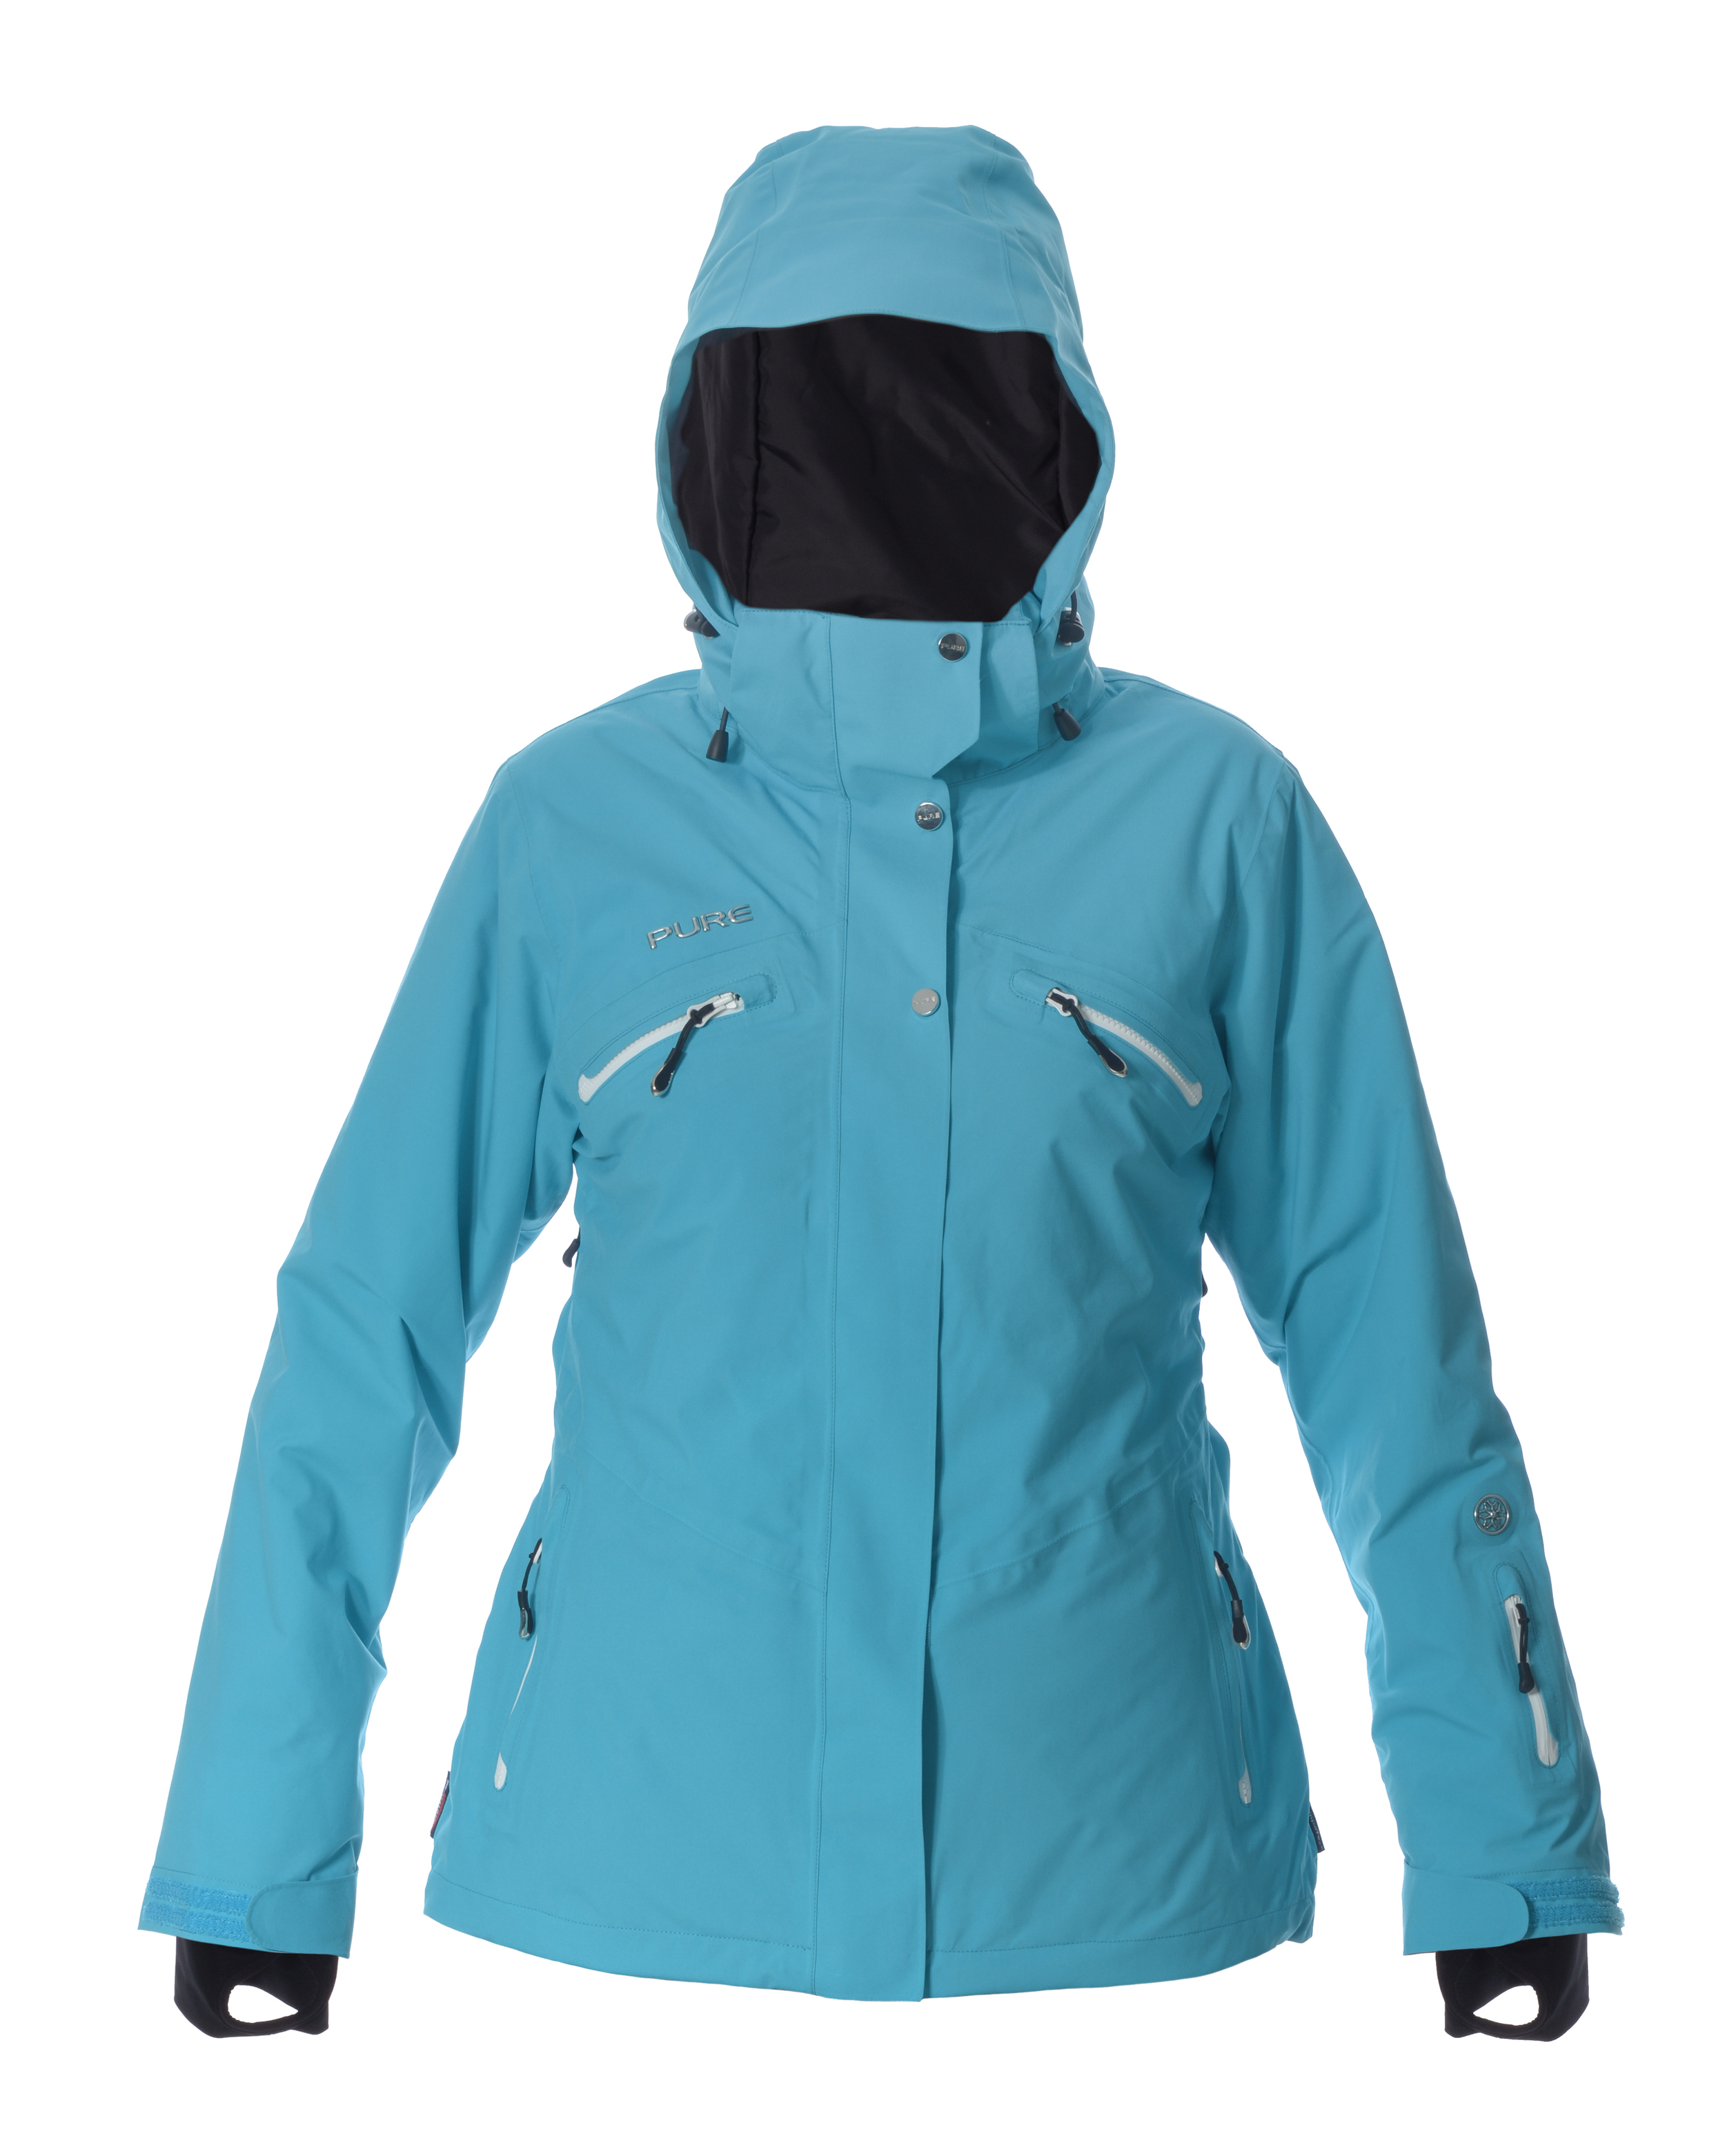 Cortina Women's Pure Snow - Tropic